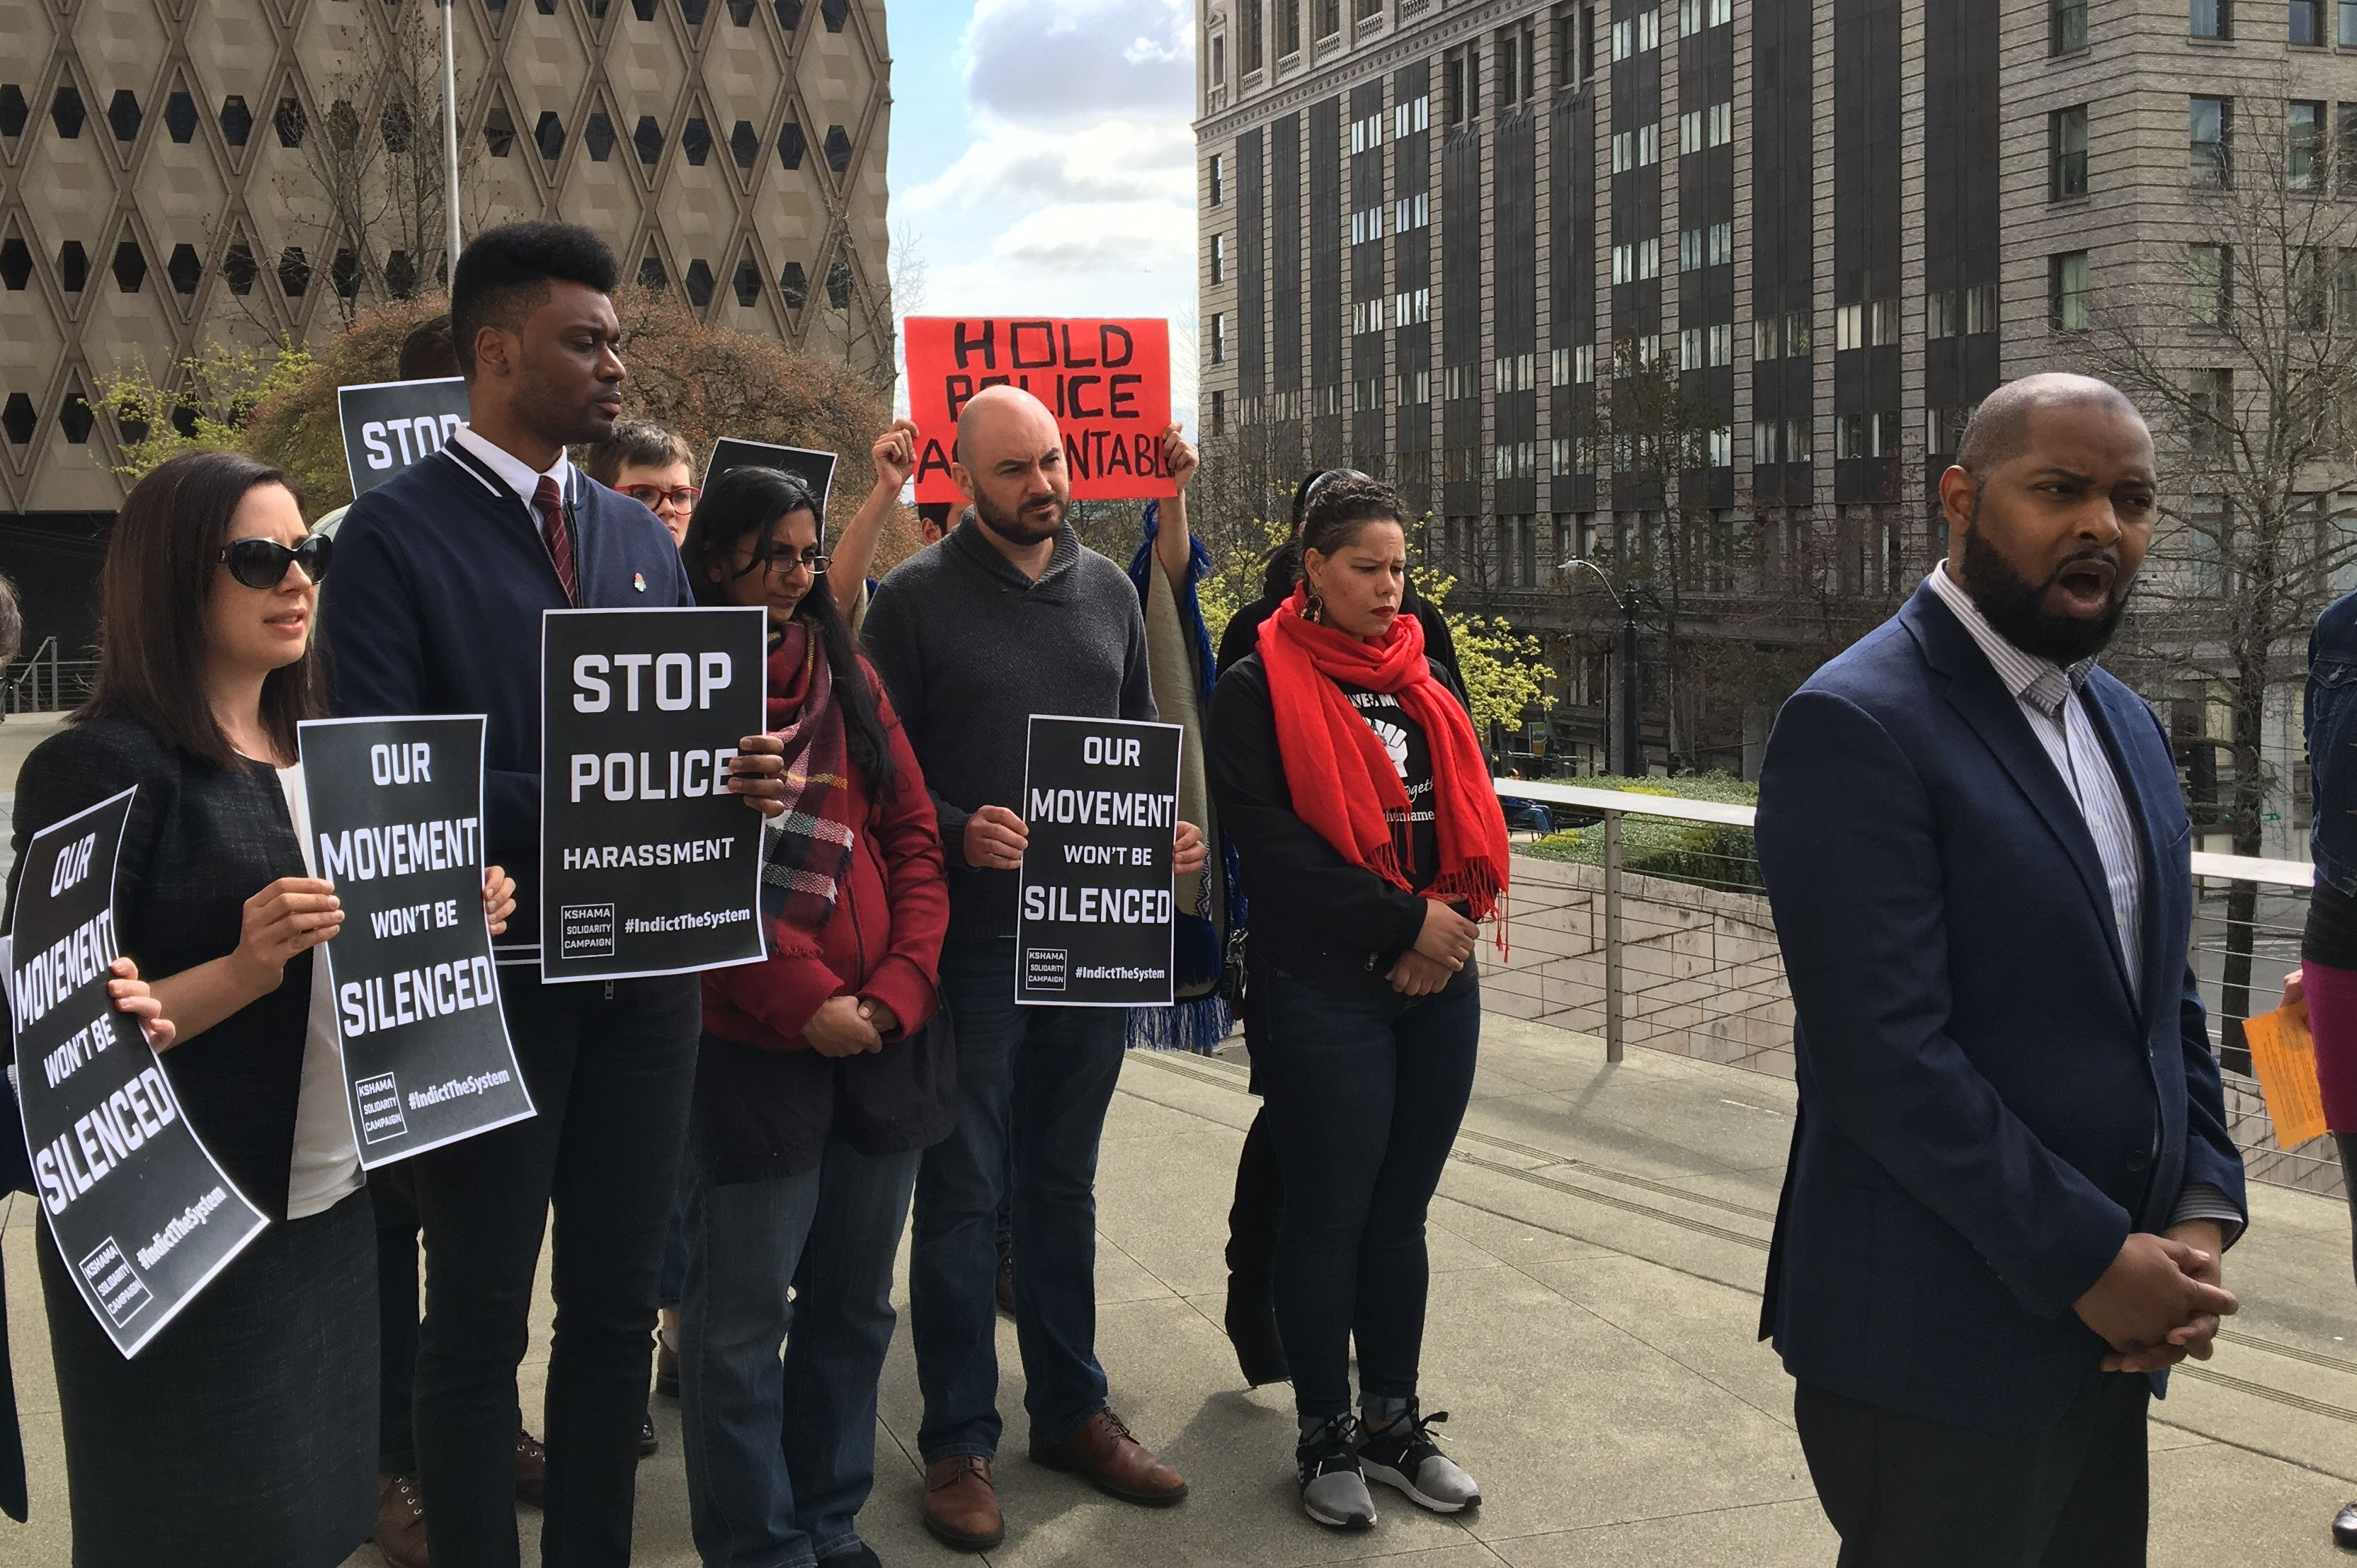 Andre taylor sawant defamation claim lawsuit 032818 vjbzlm